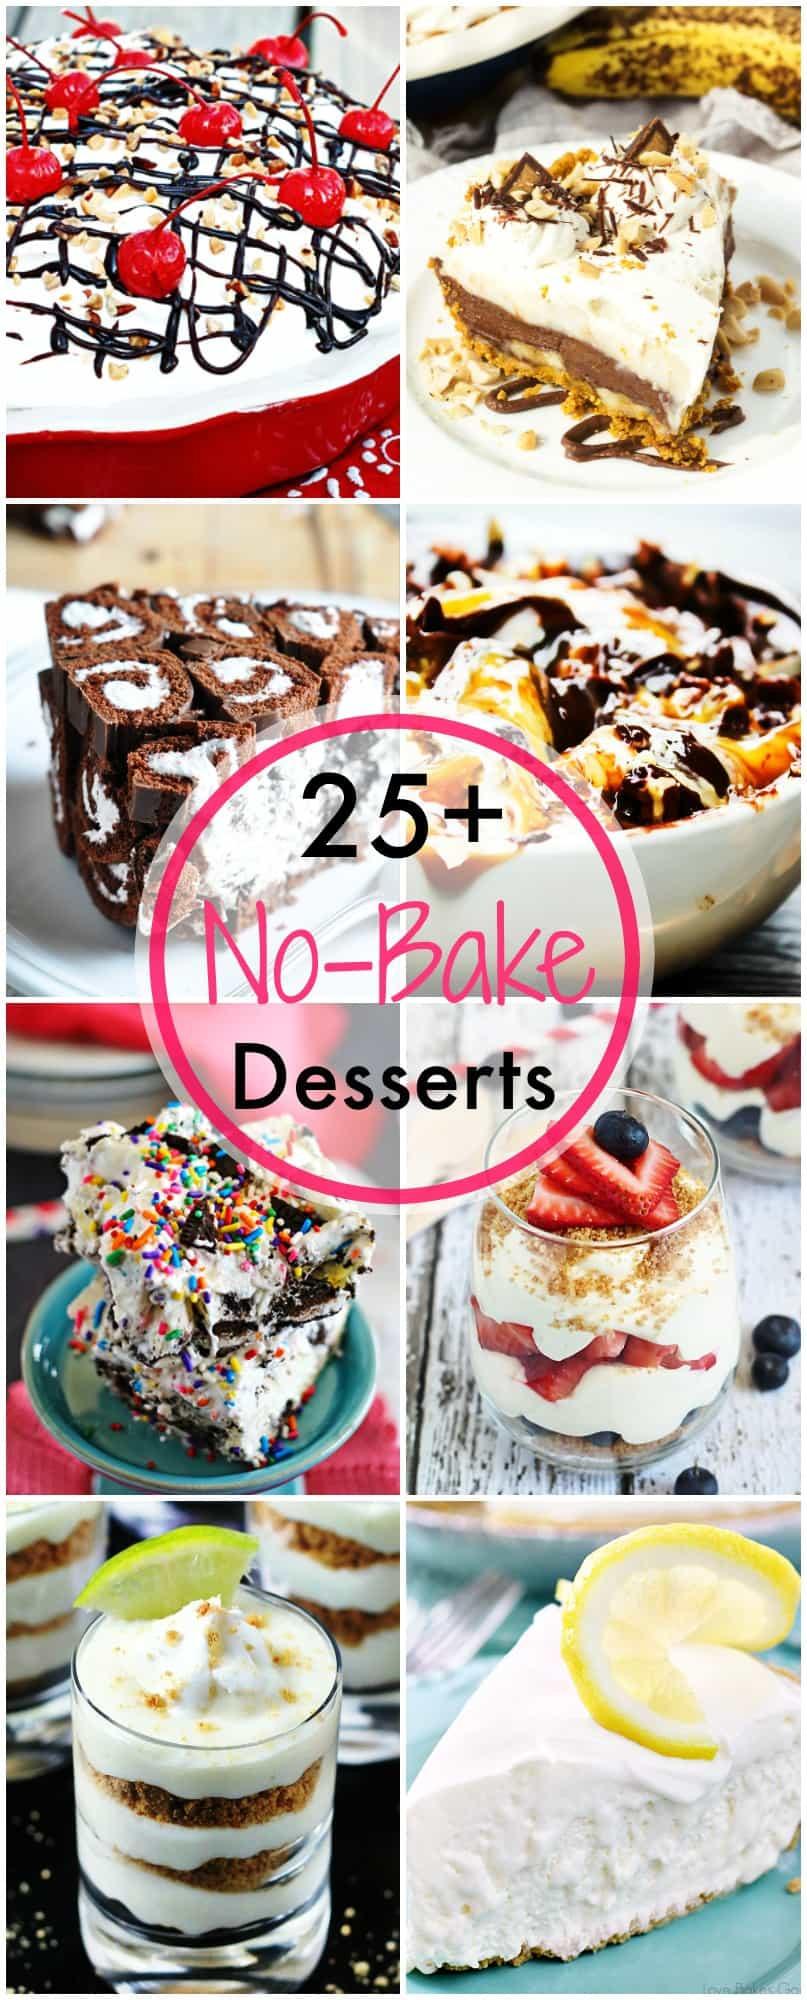 No Bake Desserts For Summer  25 No Bake Dessert Recipes